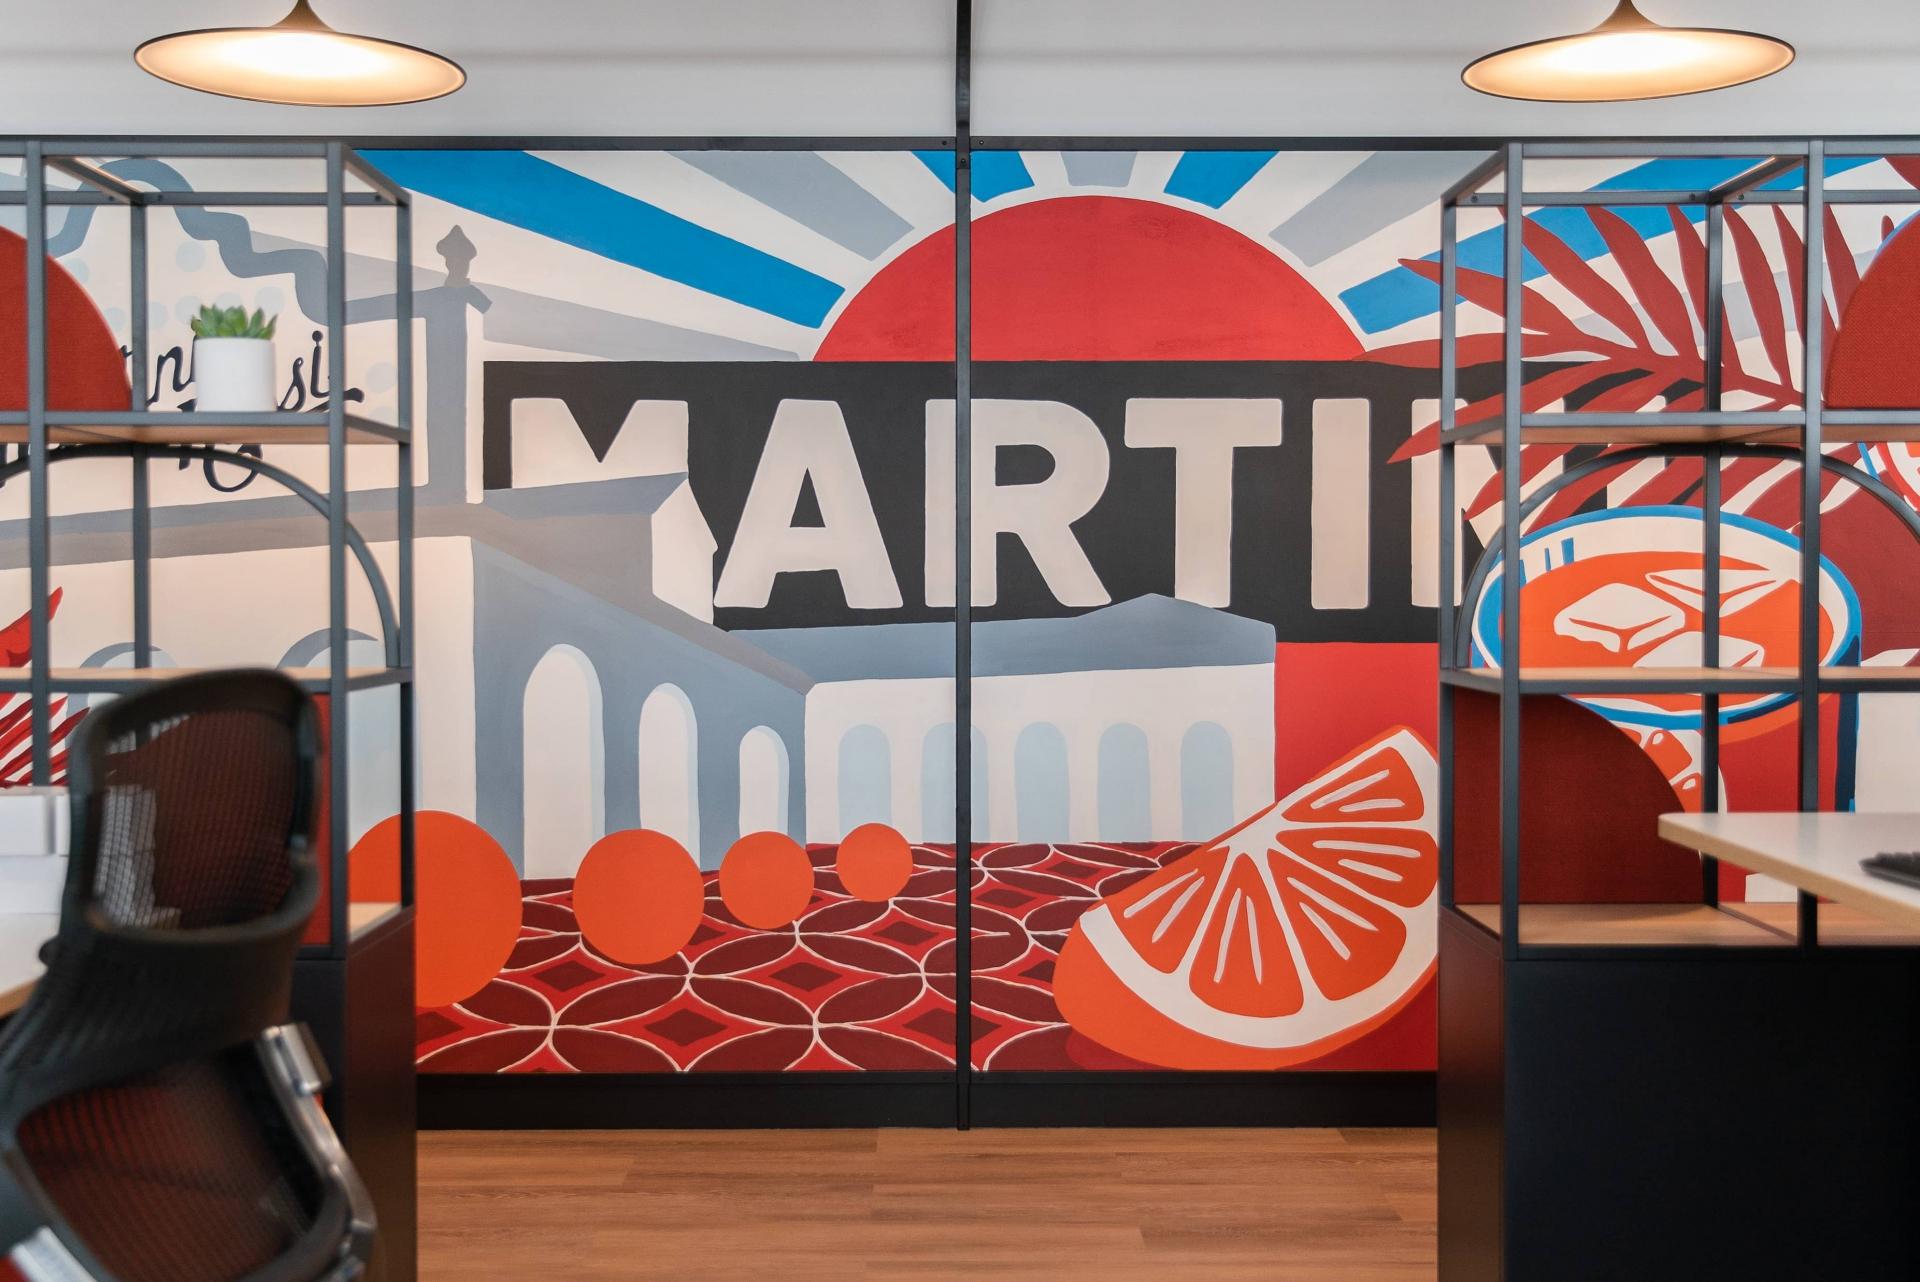 Martini x Deborah Desmada